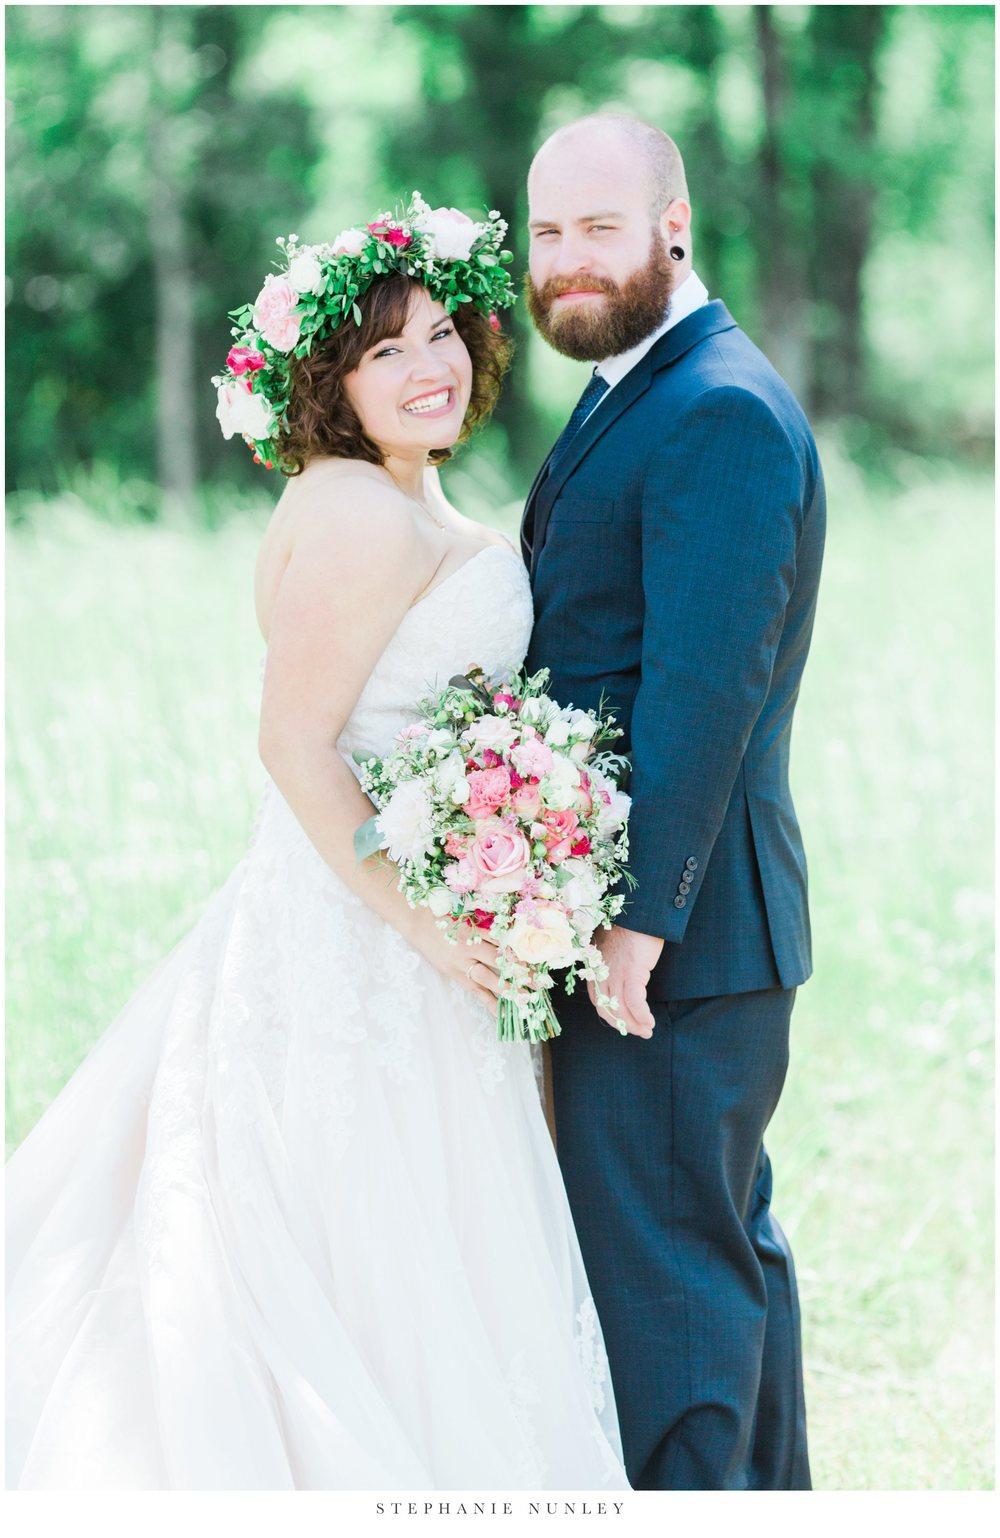 romantic-outdoor-wedding-with-flower-crown-0059.jpg